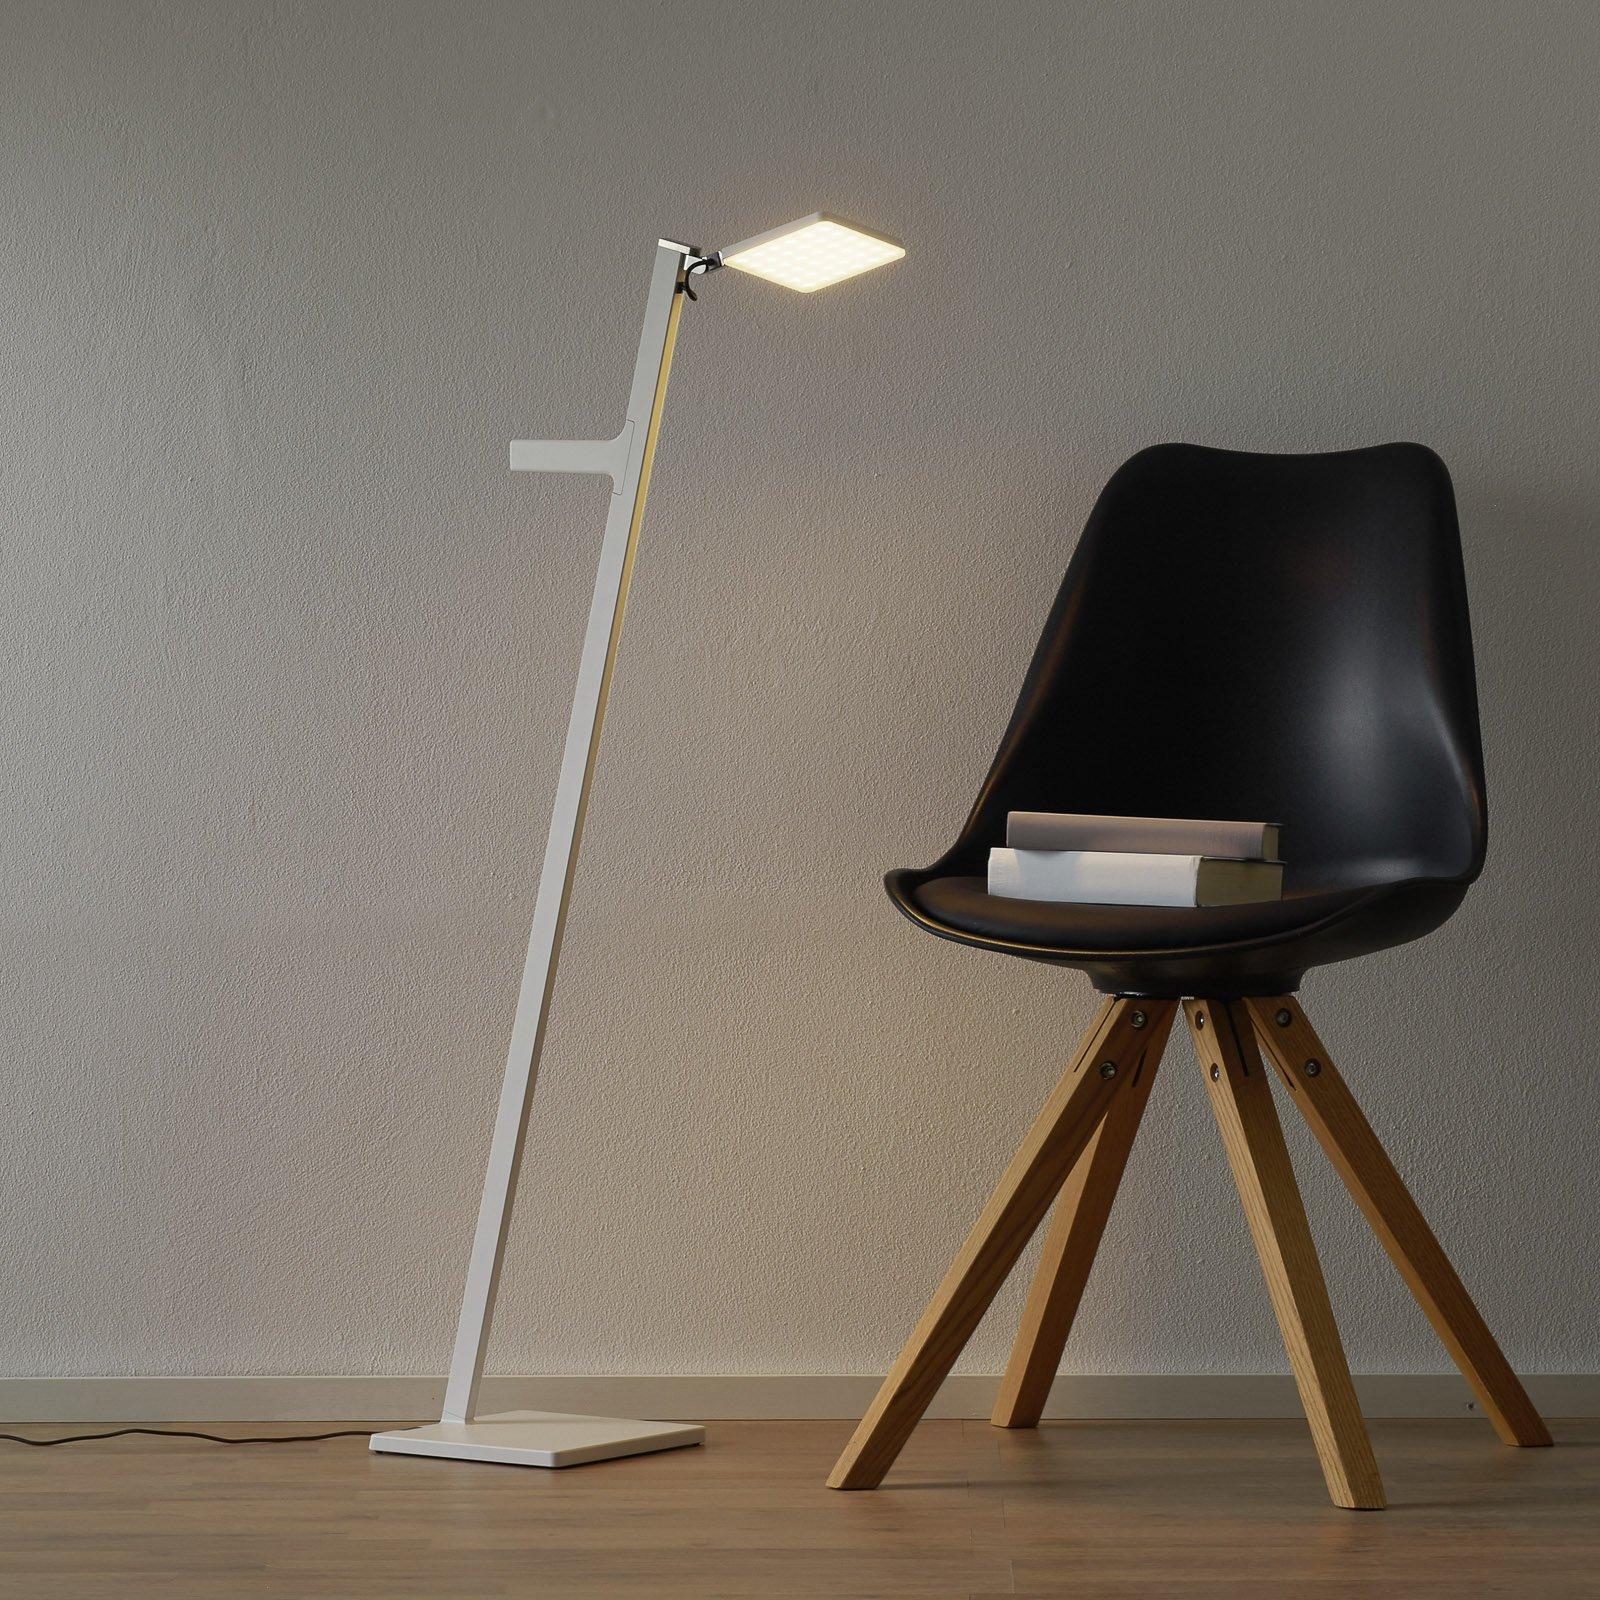 Nimbus Roxxane Leggera LED-gulvlampe, hvit